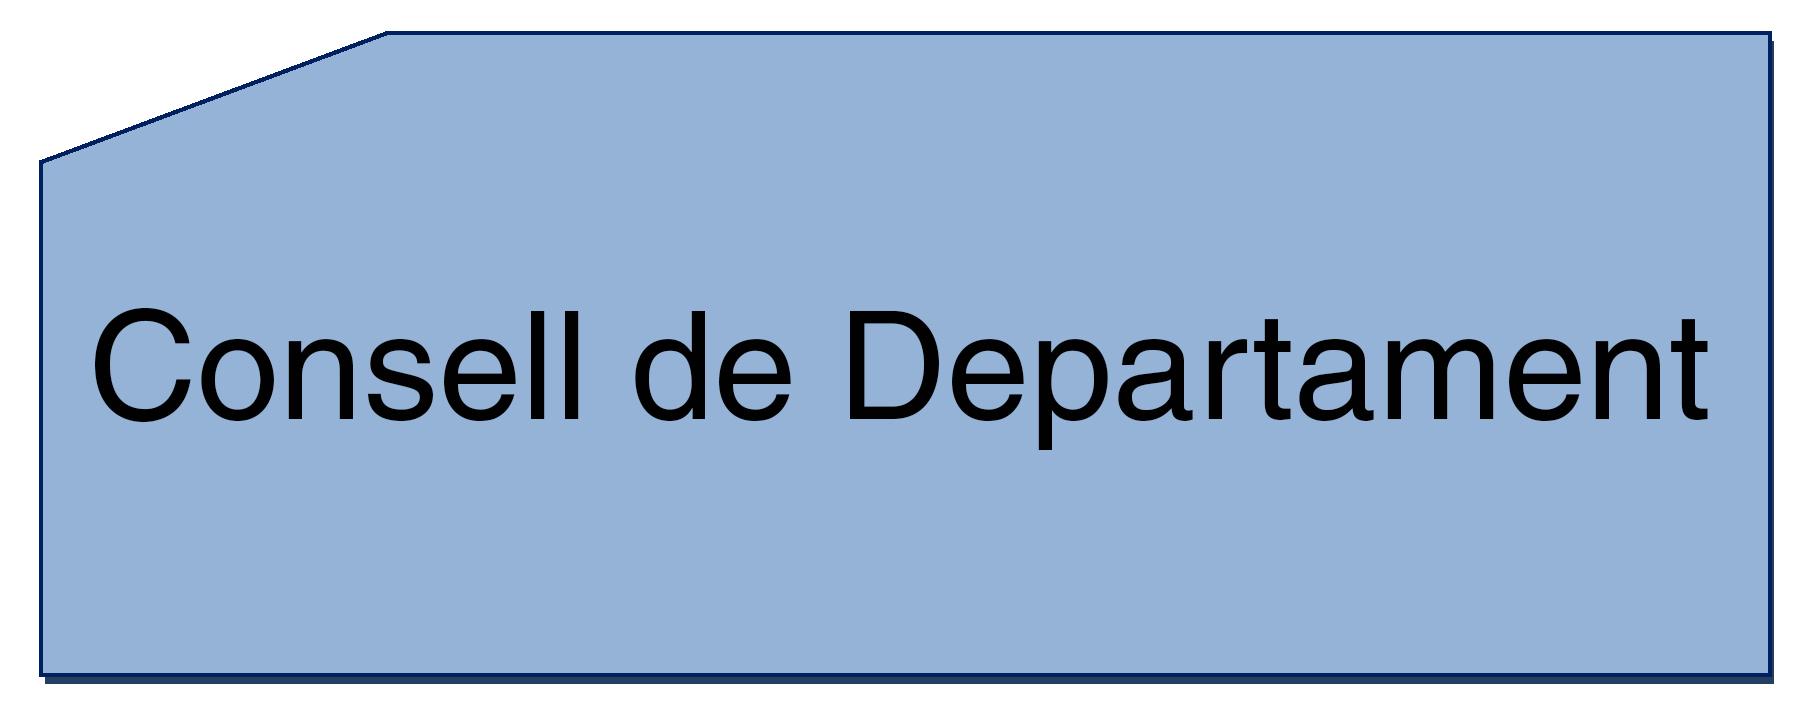 Consell departament